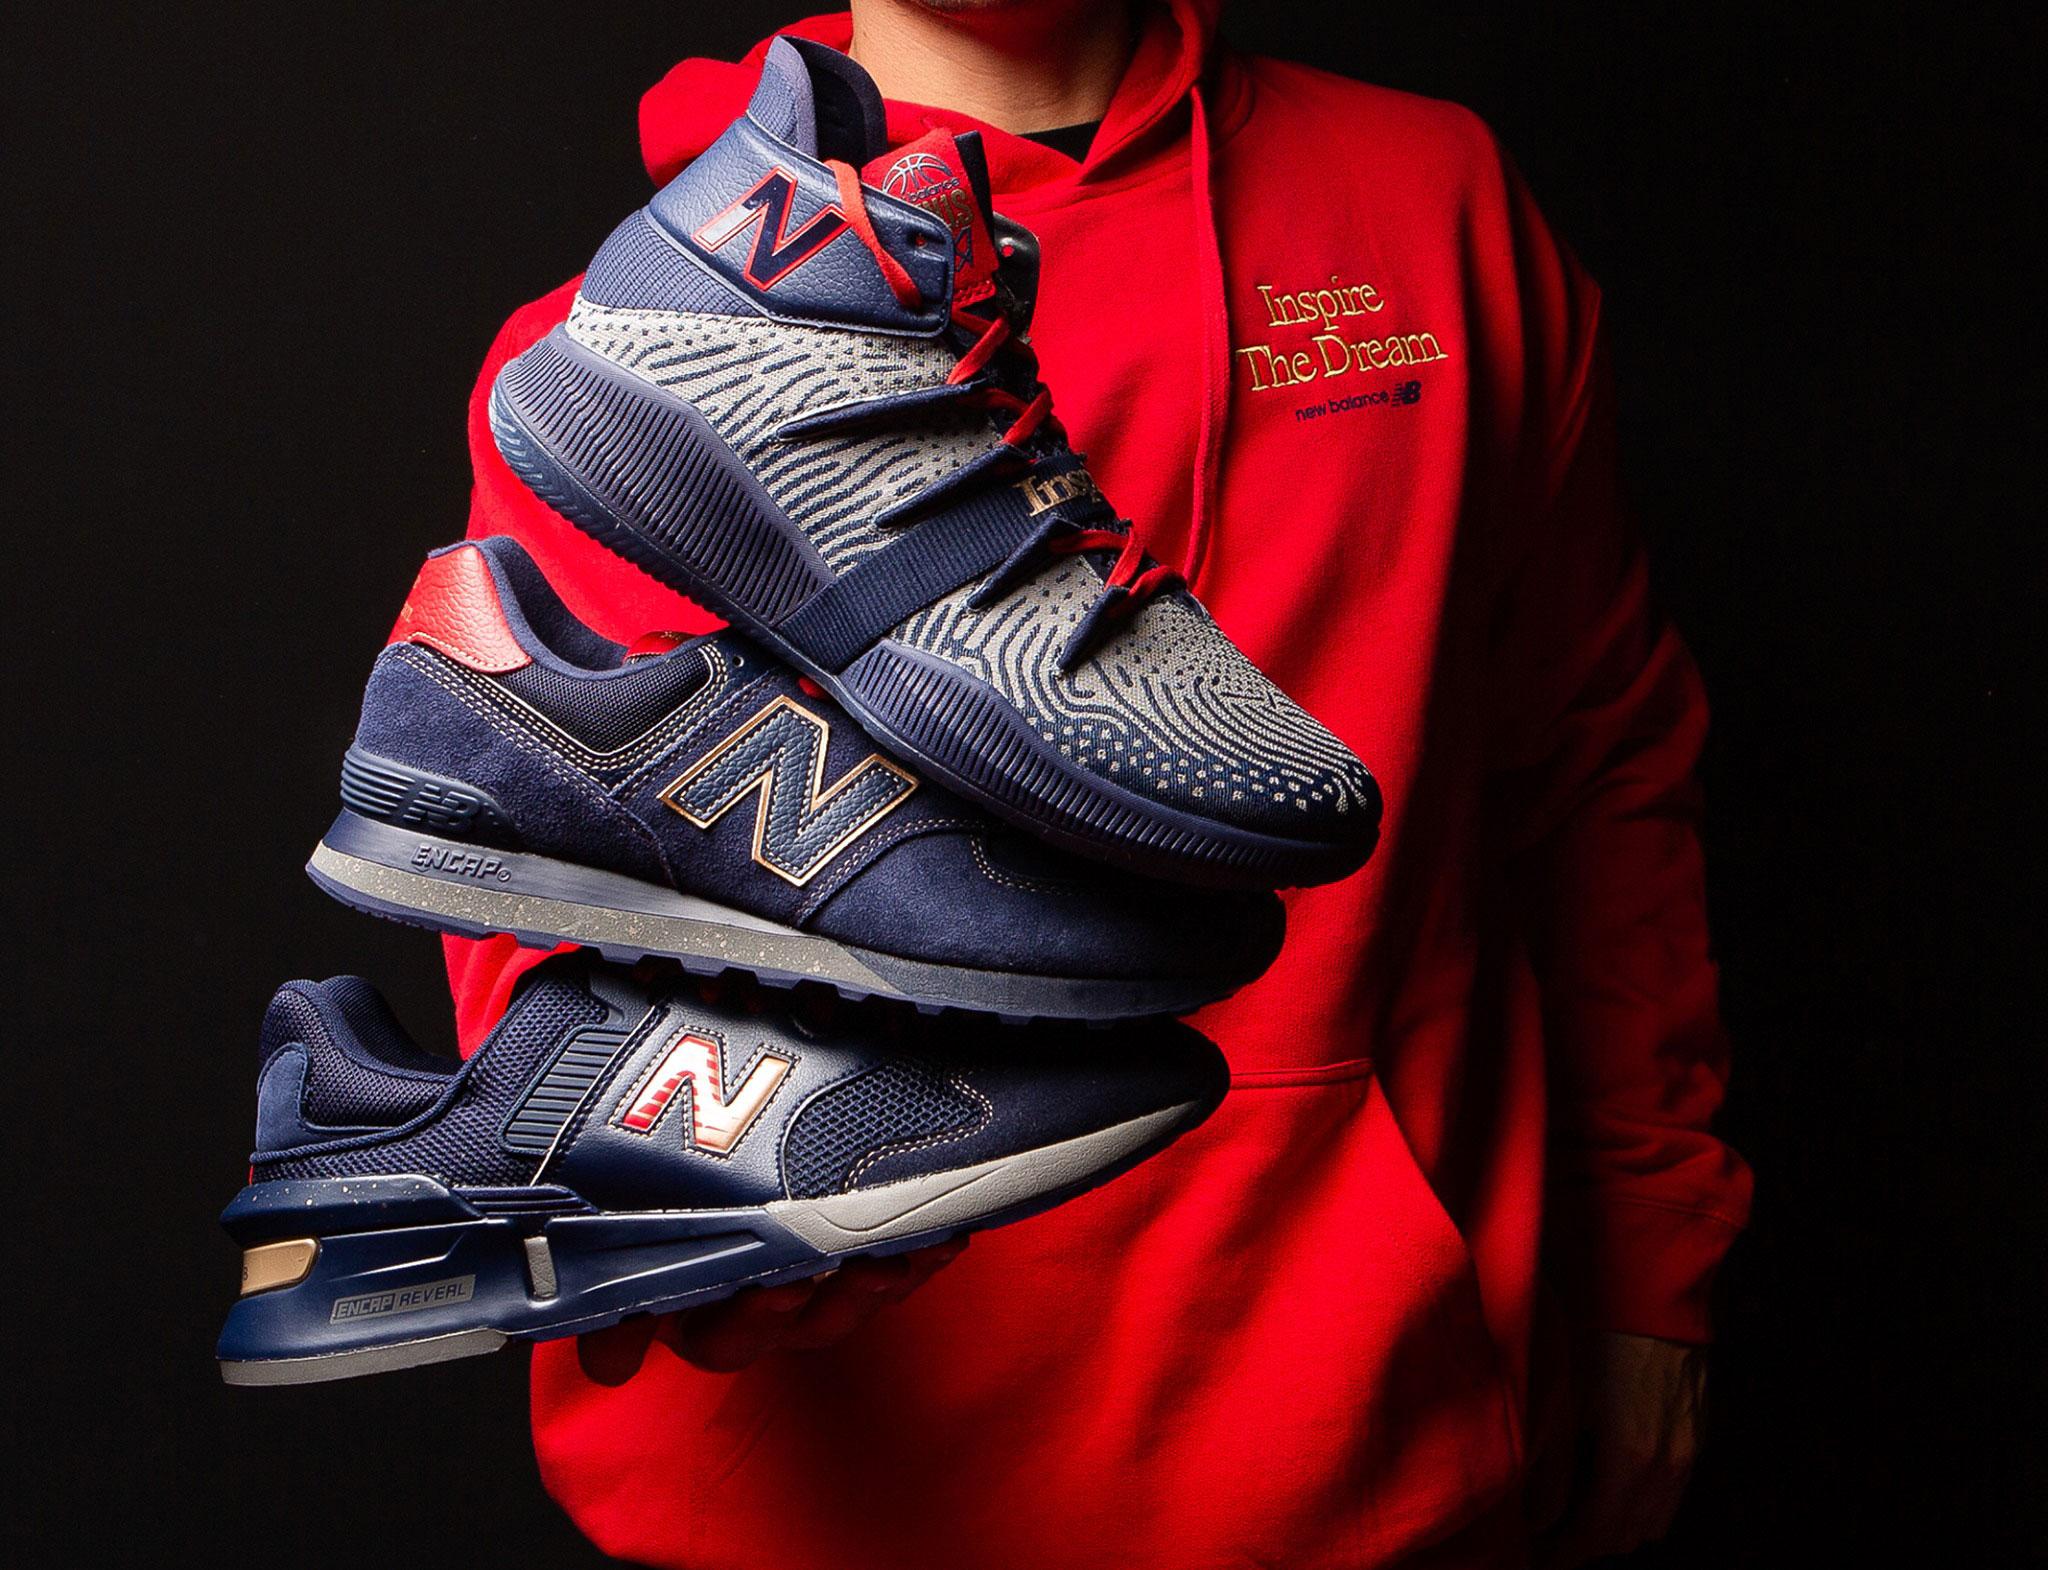 kawhi-leonard-inspire-the-dream-bhm-new-balance-shoes